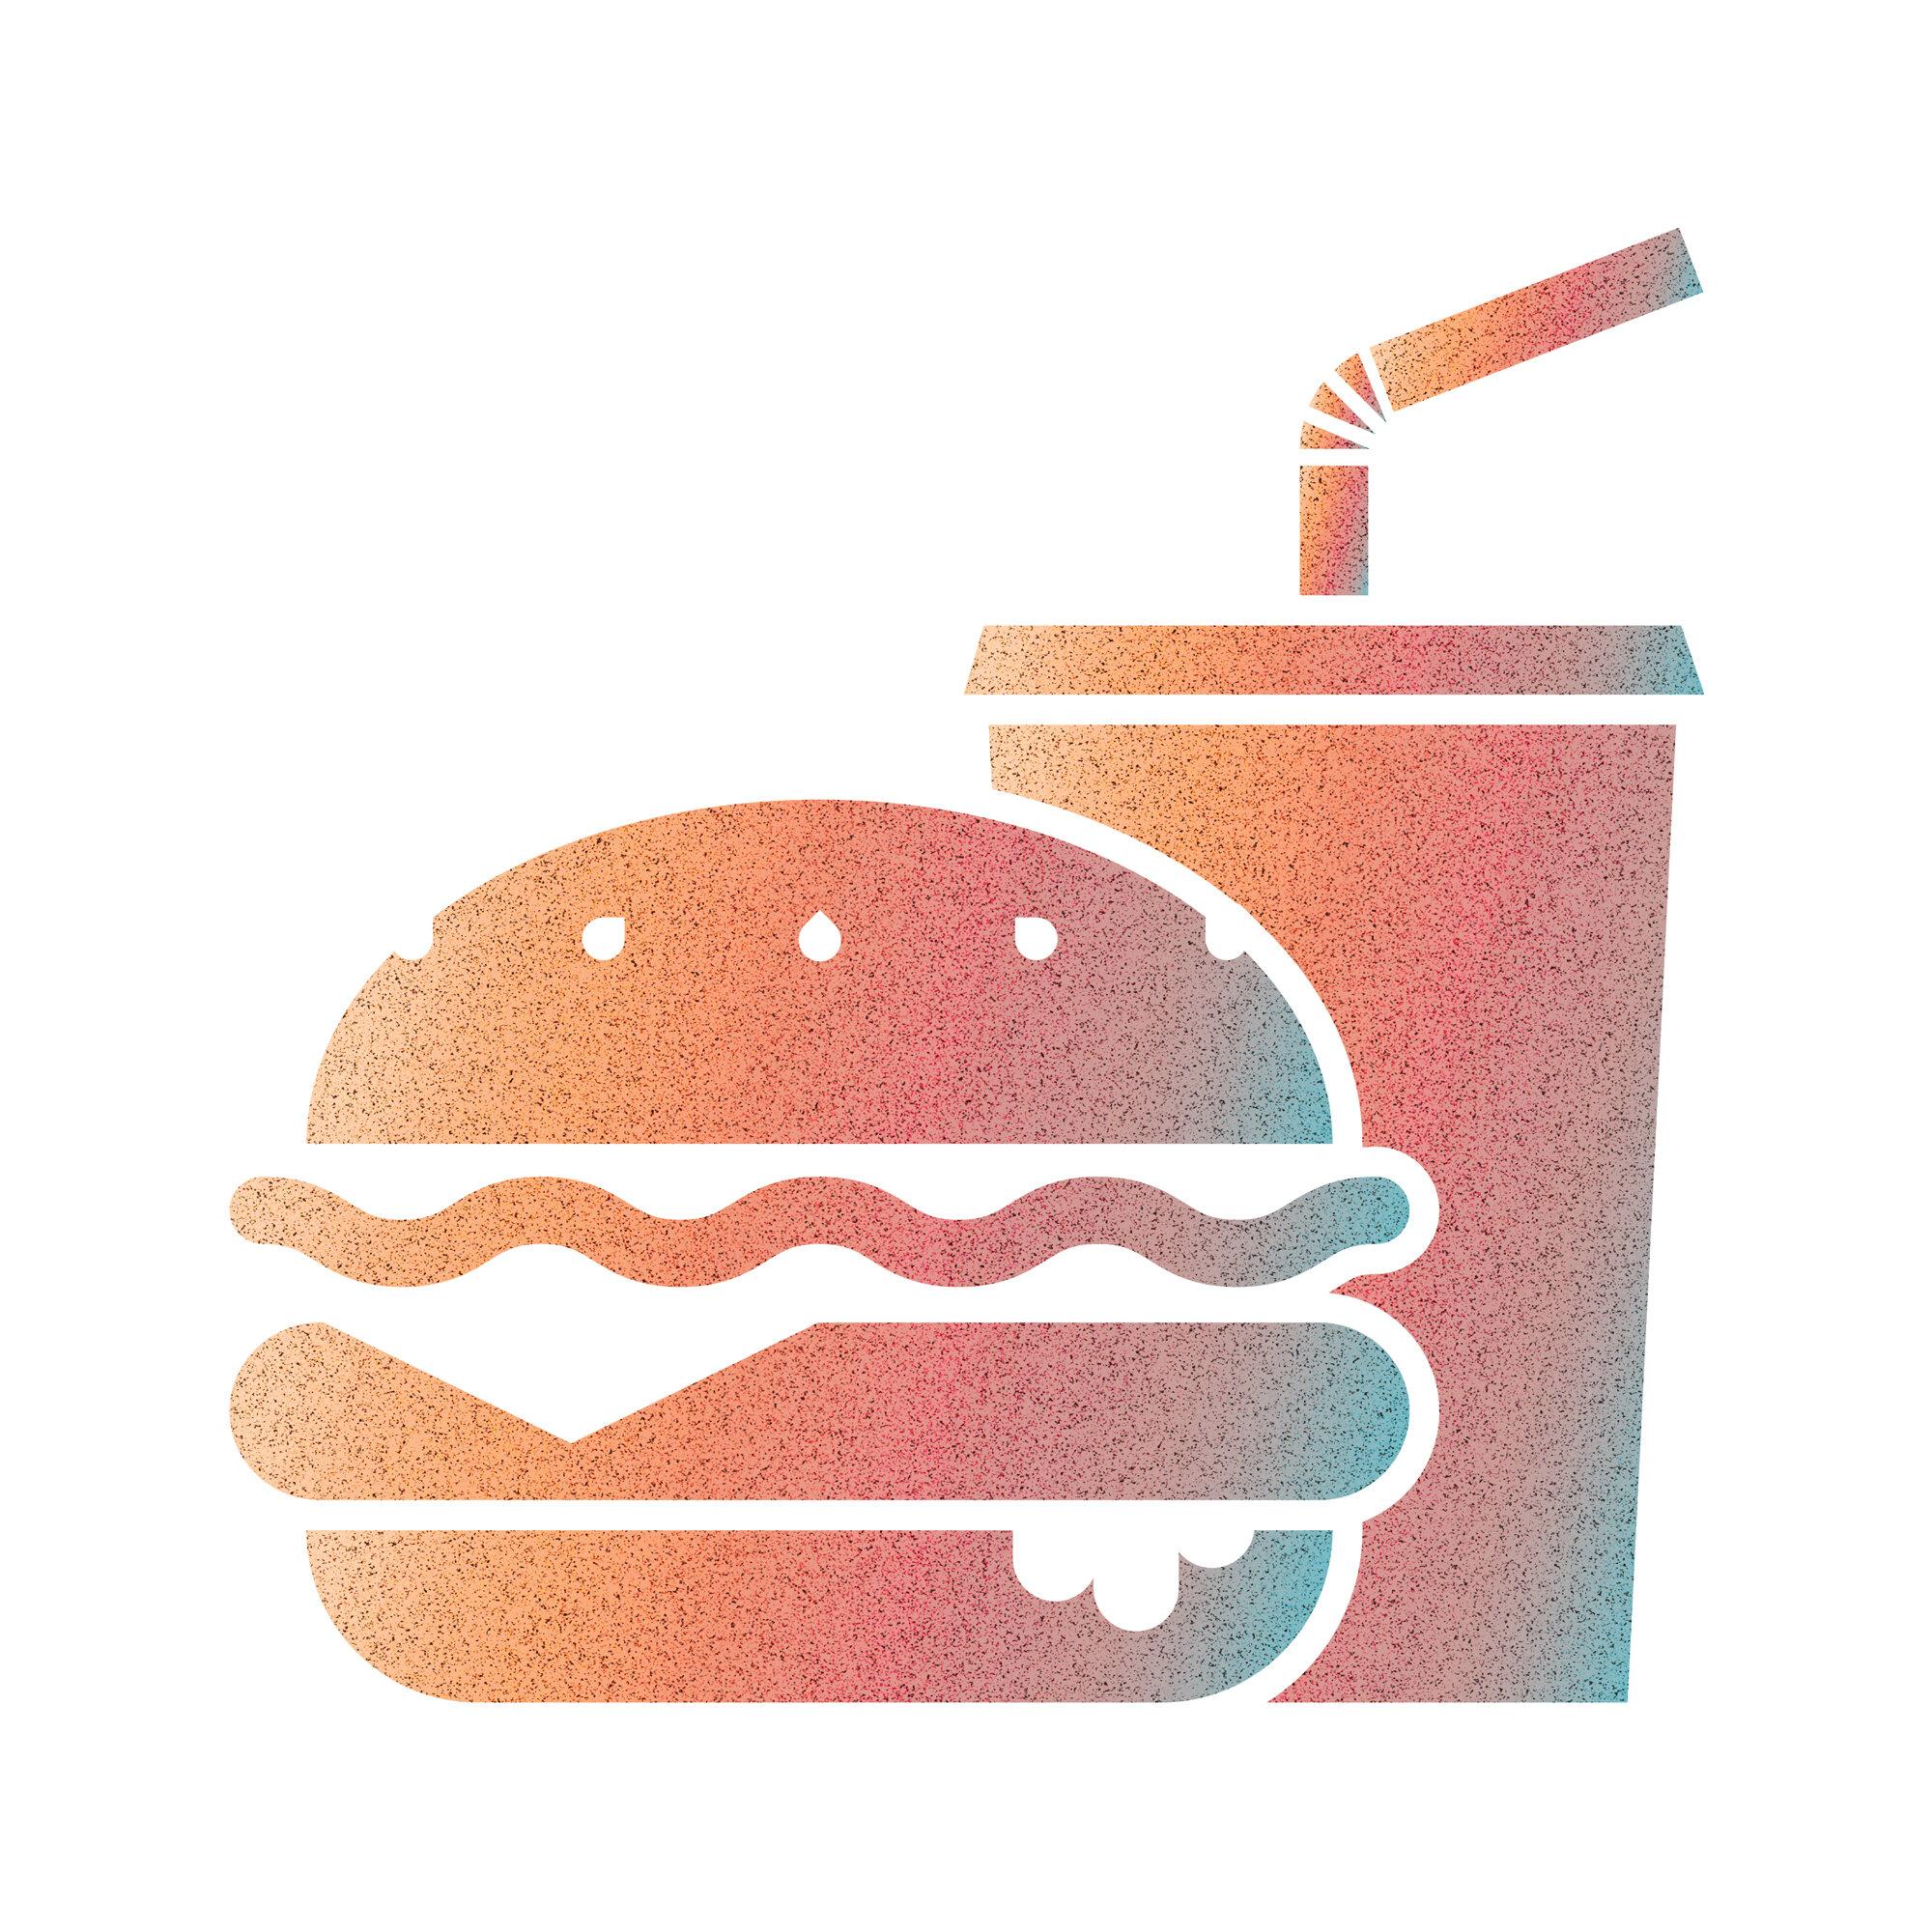 JTAD_Insta_014_food_and_drink.jpg